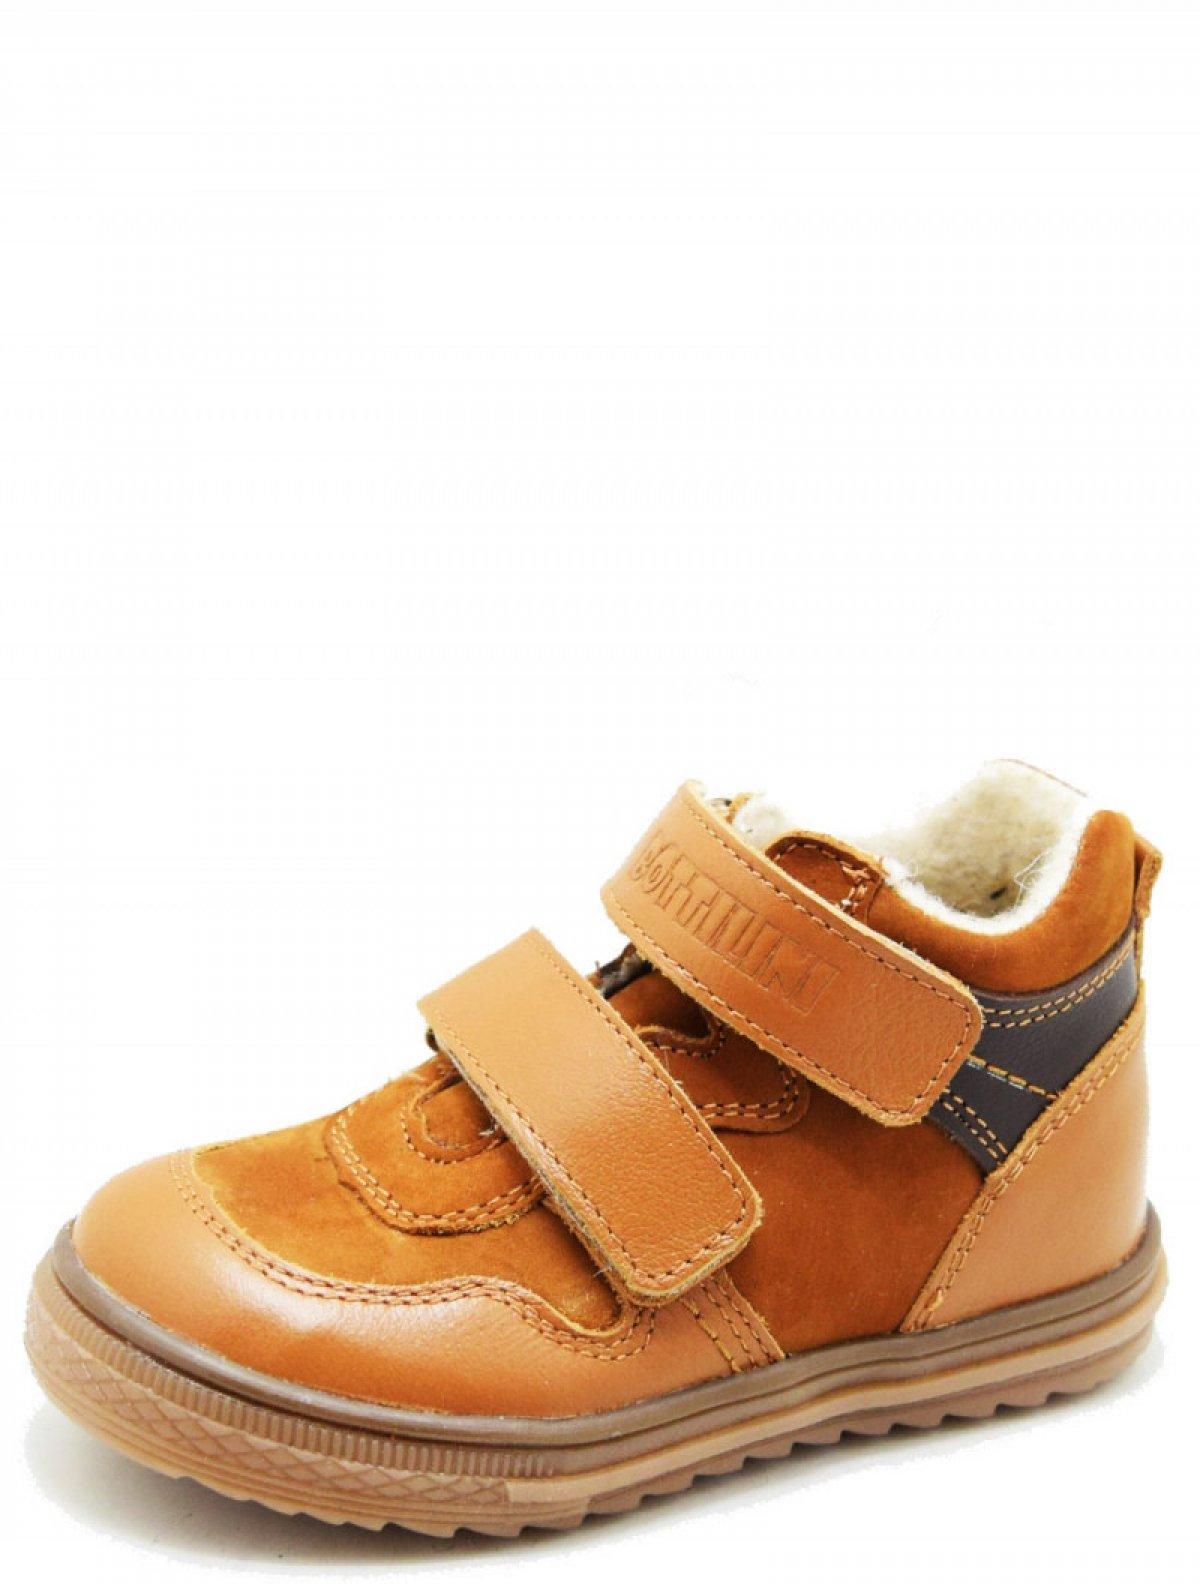 Bottilini BL-106(1) ботинки для девочки